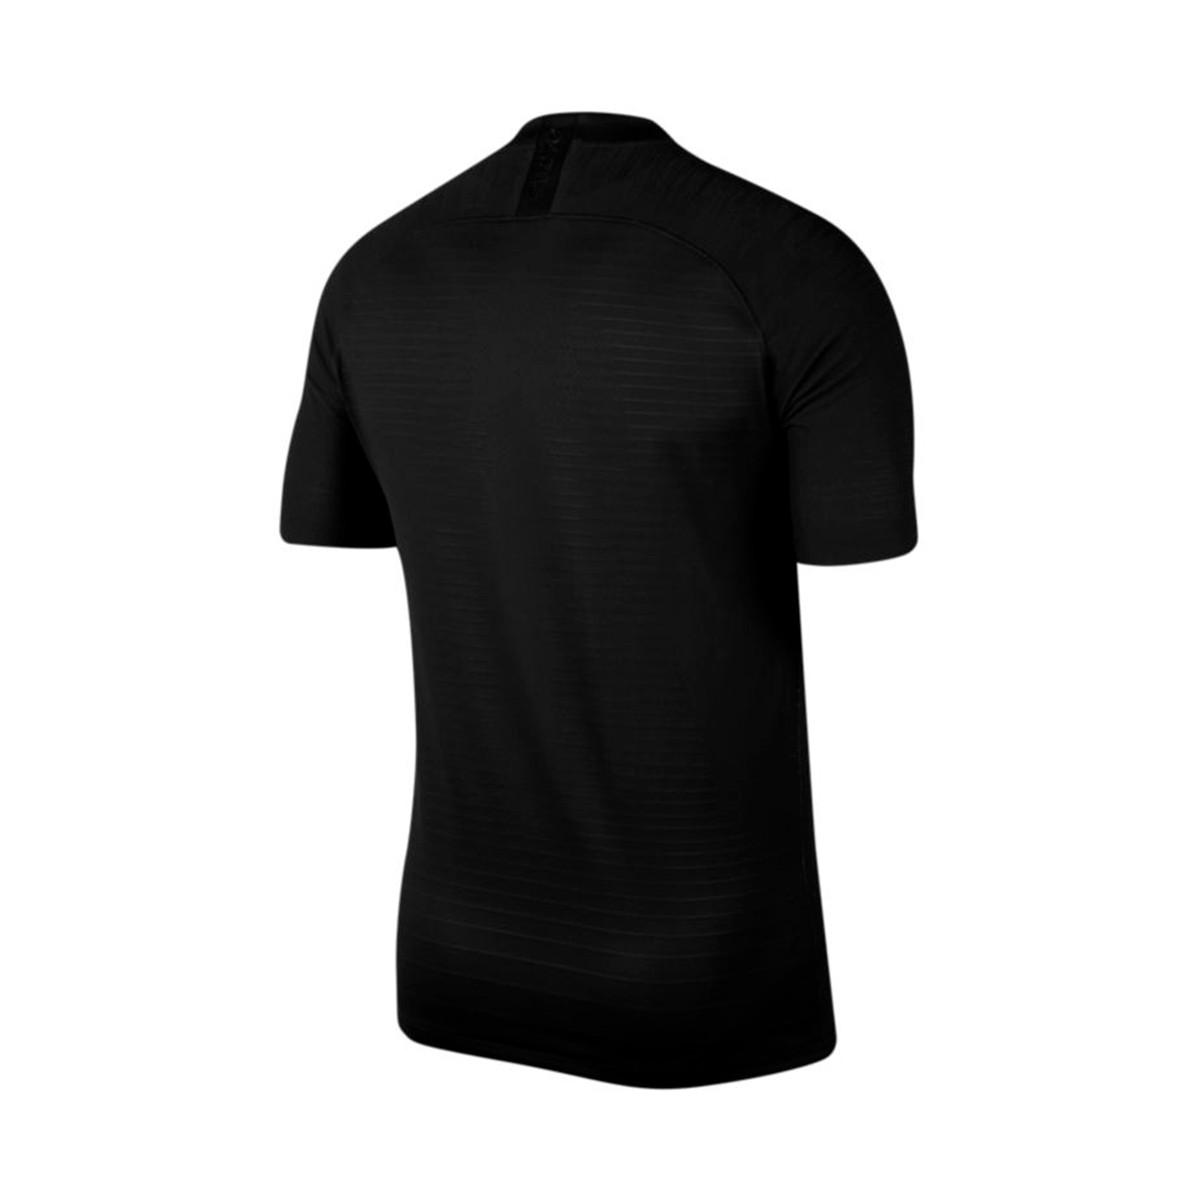 Maillot Nike Jordan X Psg Vapor Match 4eme Tenue 2019 2020 Black White Boutique De Football Futbol Emotion